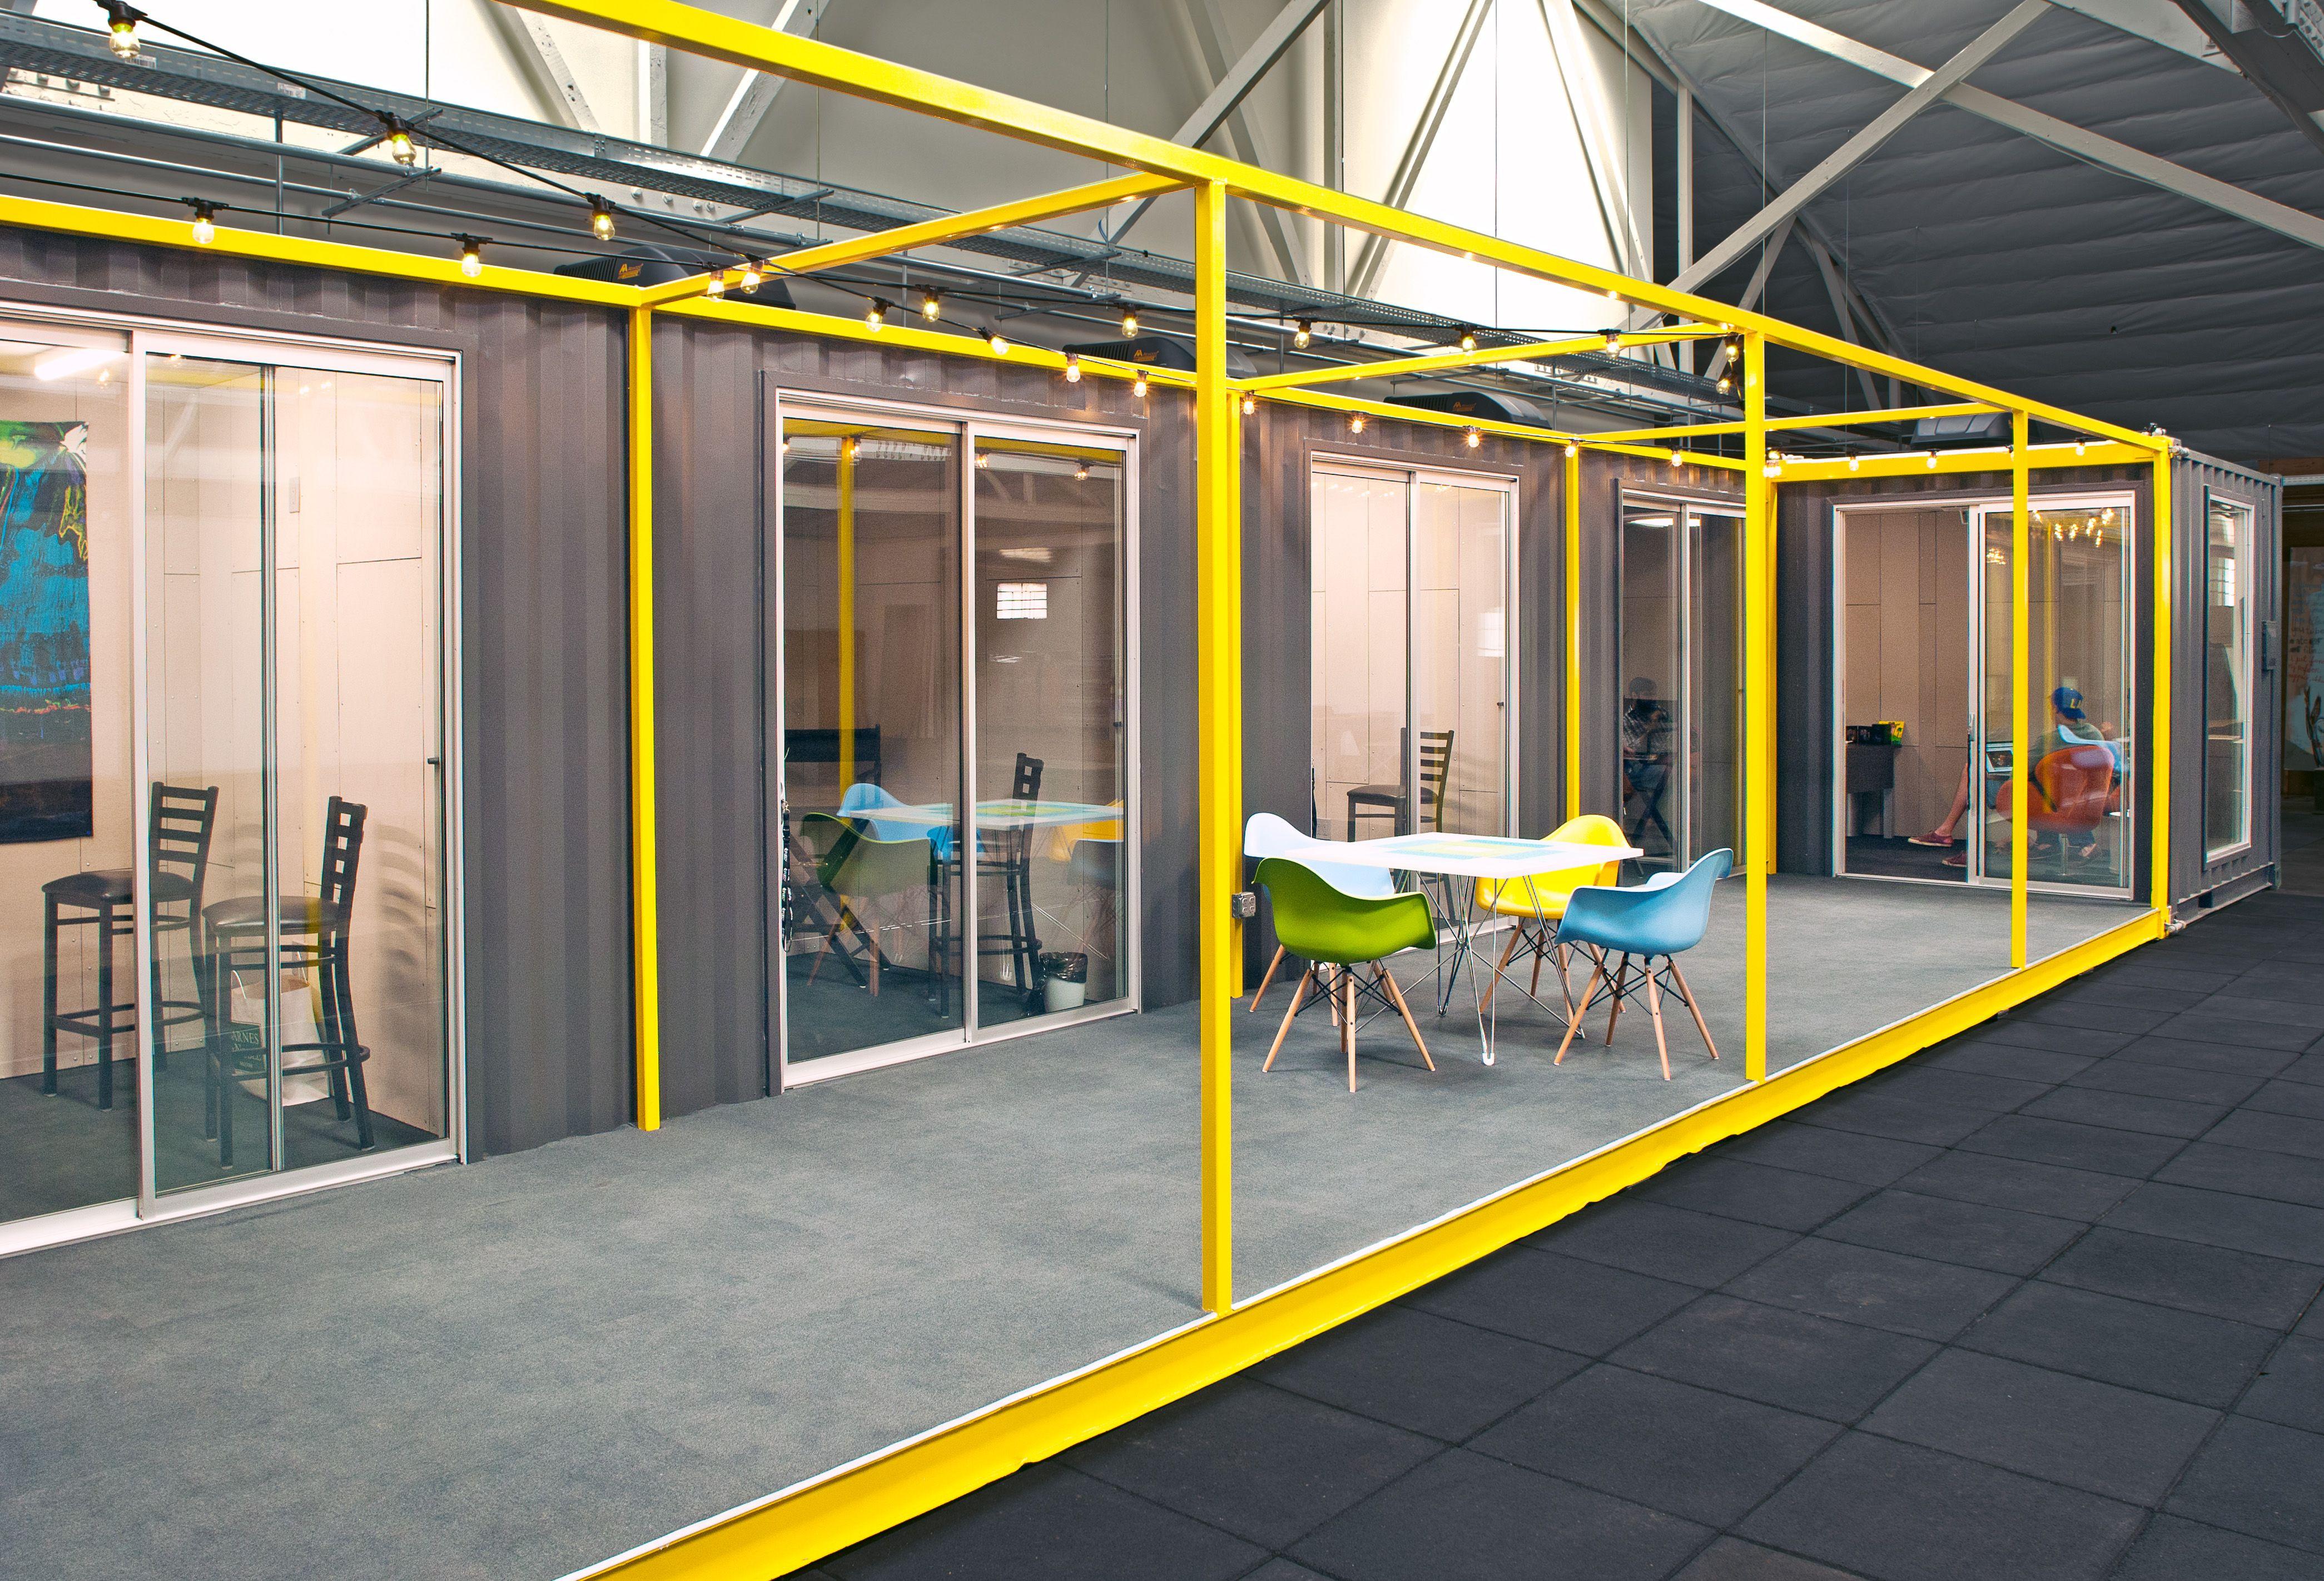 high end industrial office container workspace cubedepot. Black Bedroom Furniture Sets. Home Design Ideas